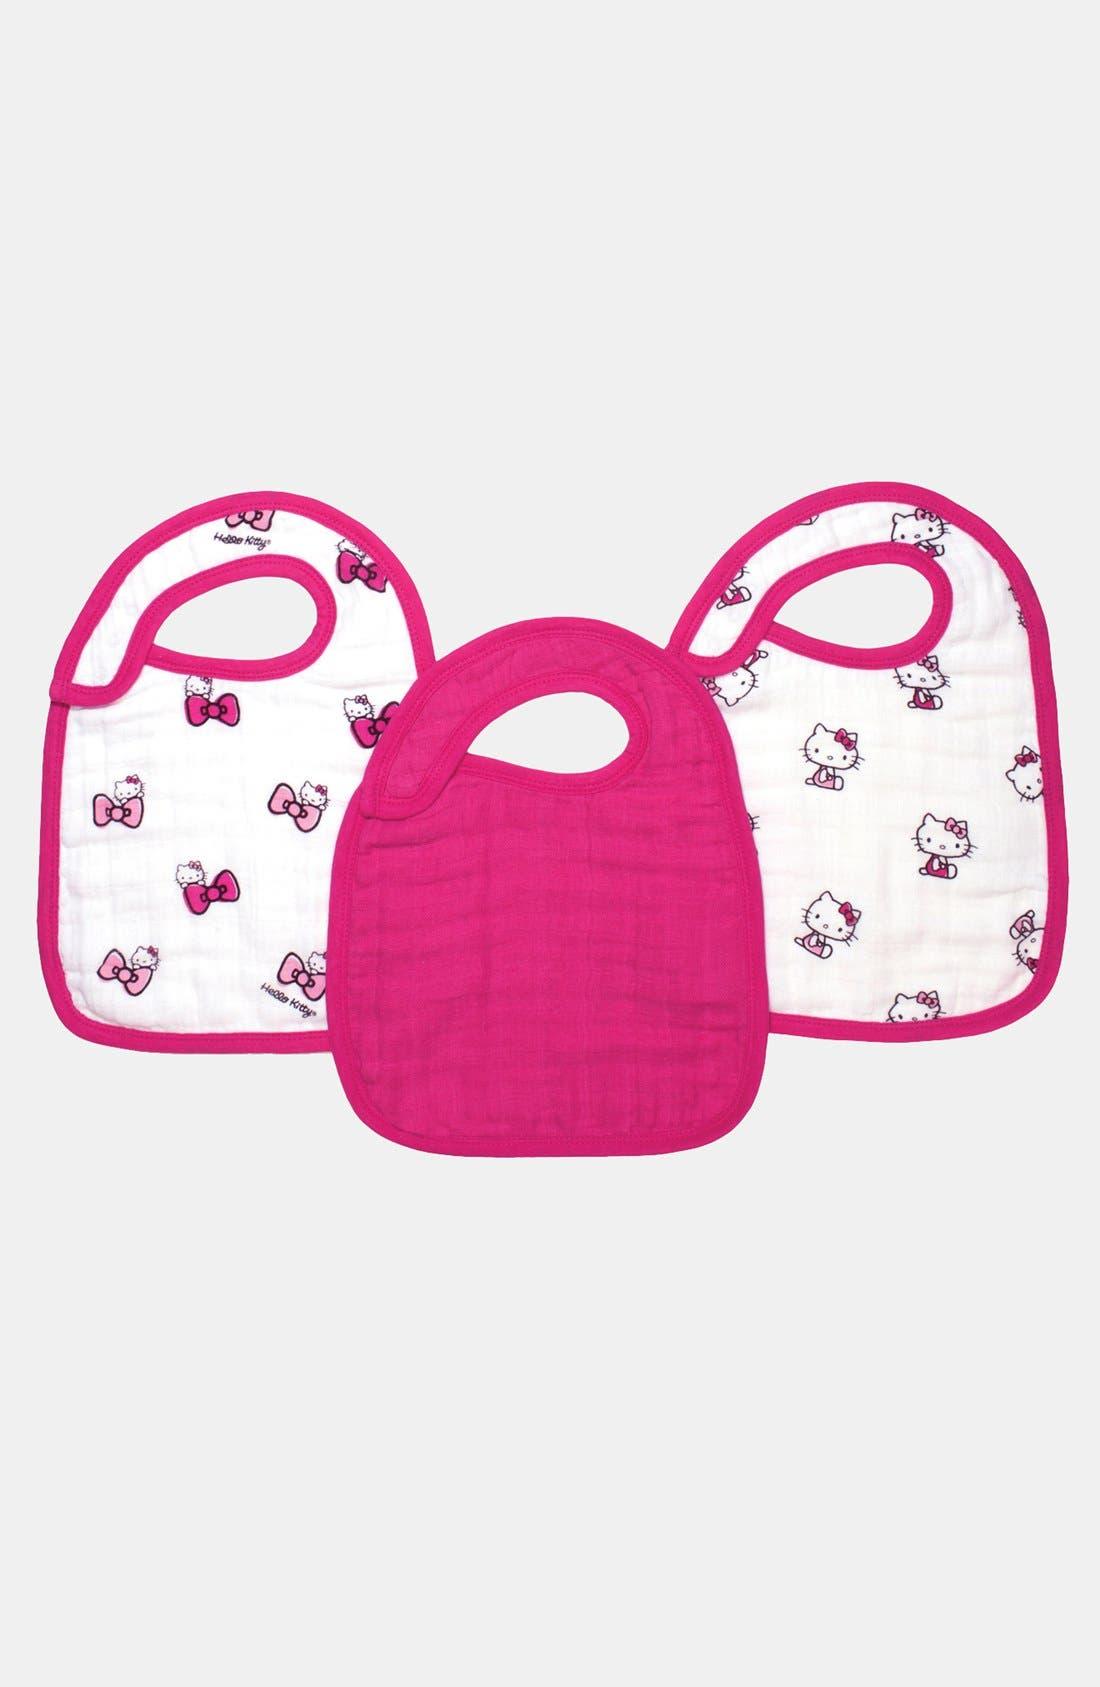 Main Image - aden + anais Hello Kitty® Snap Bibs (3-pack)